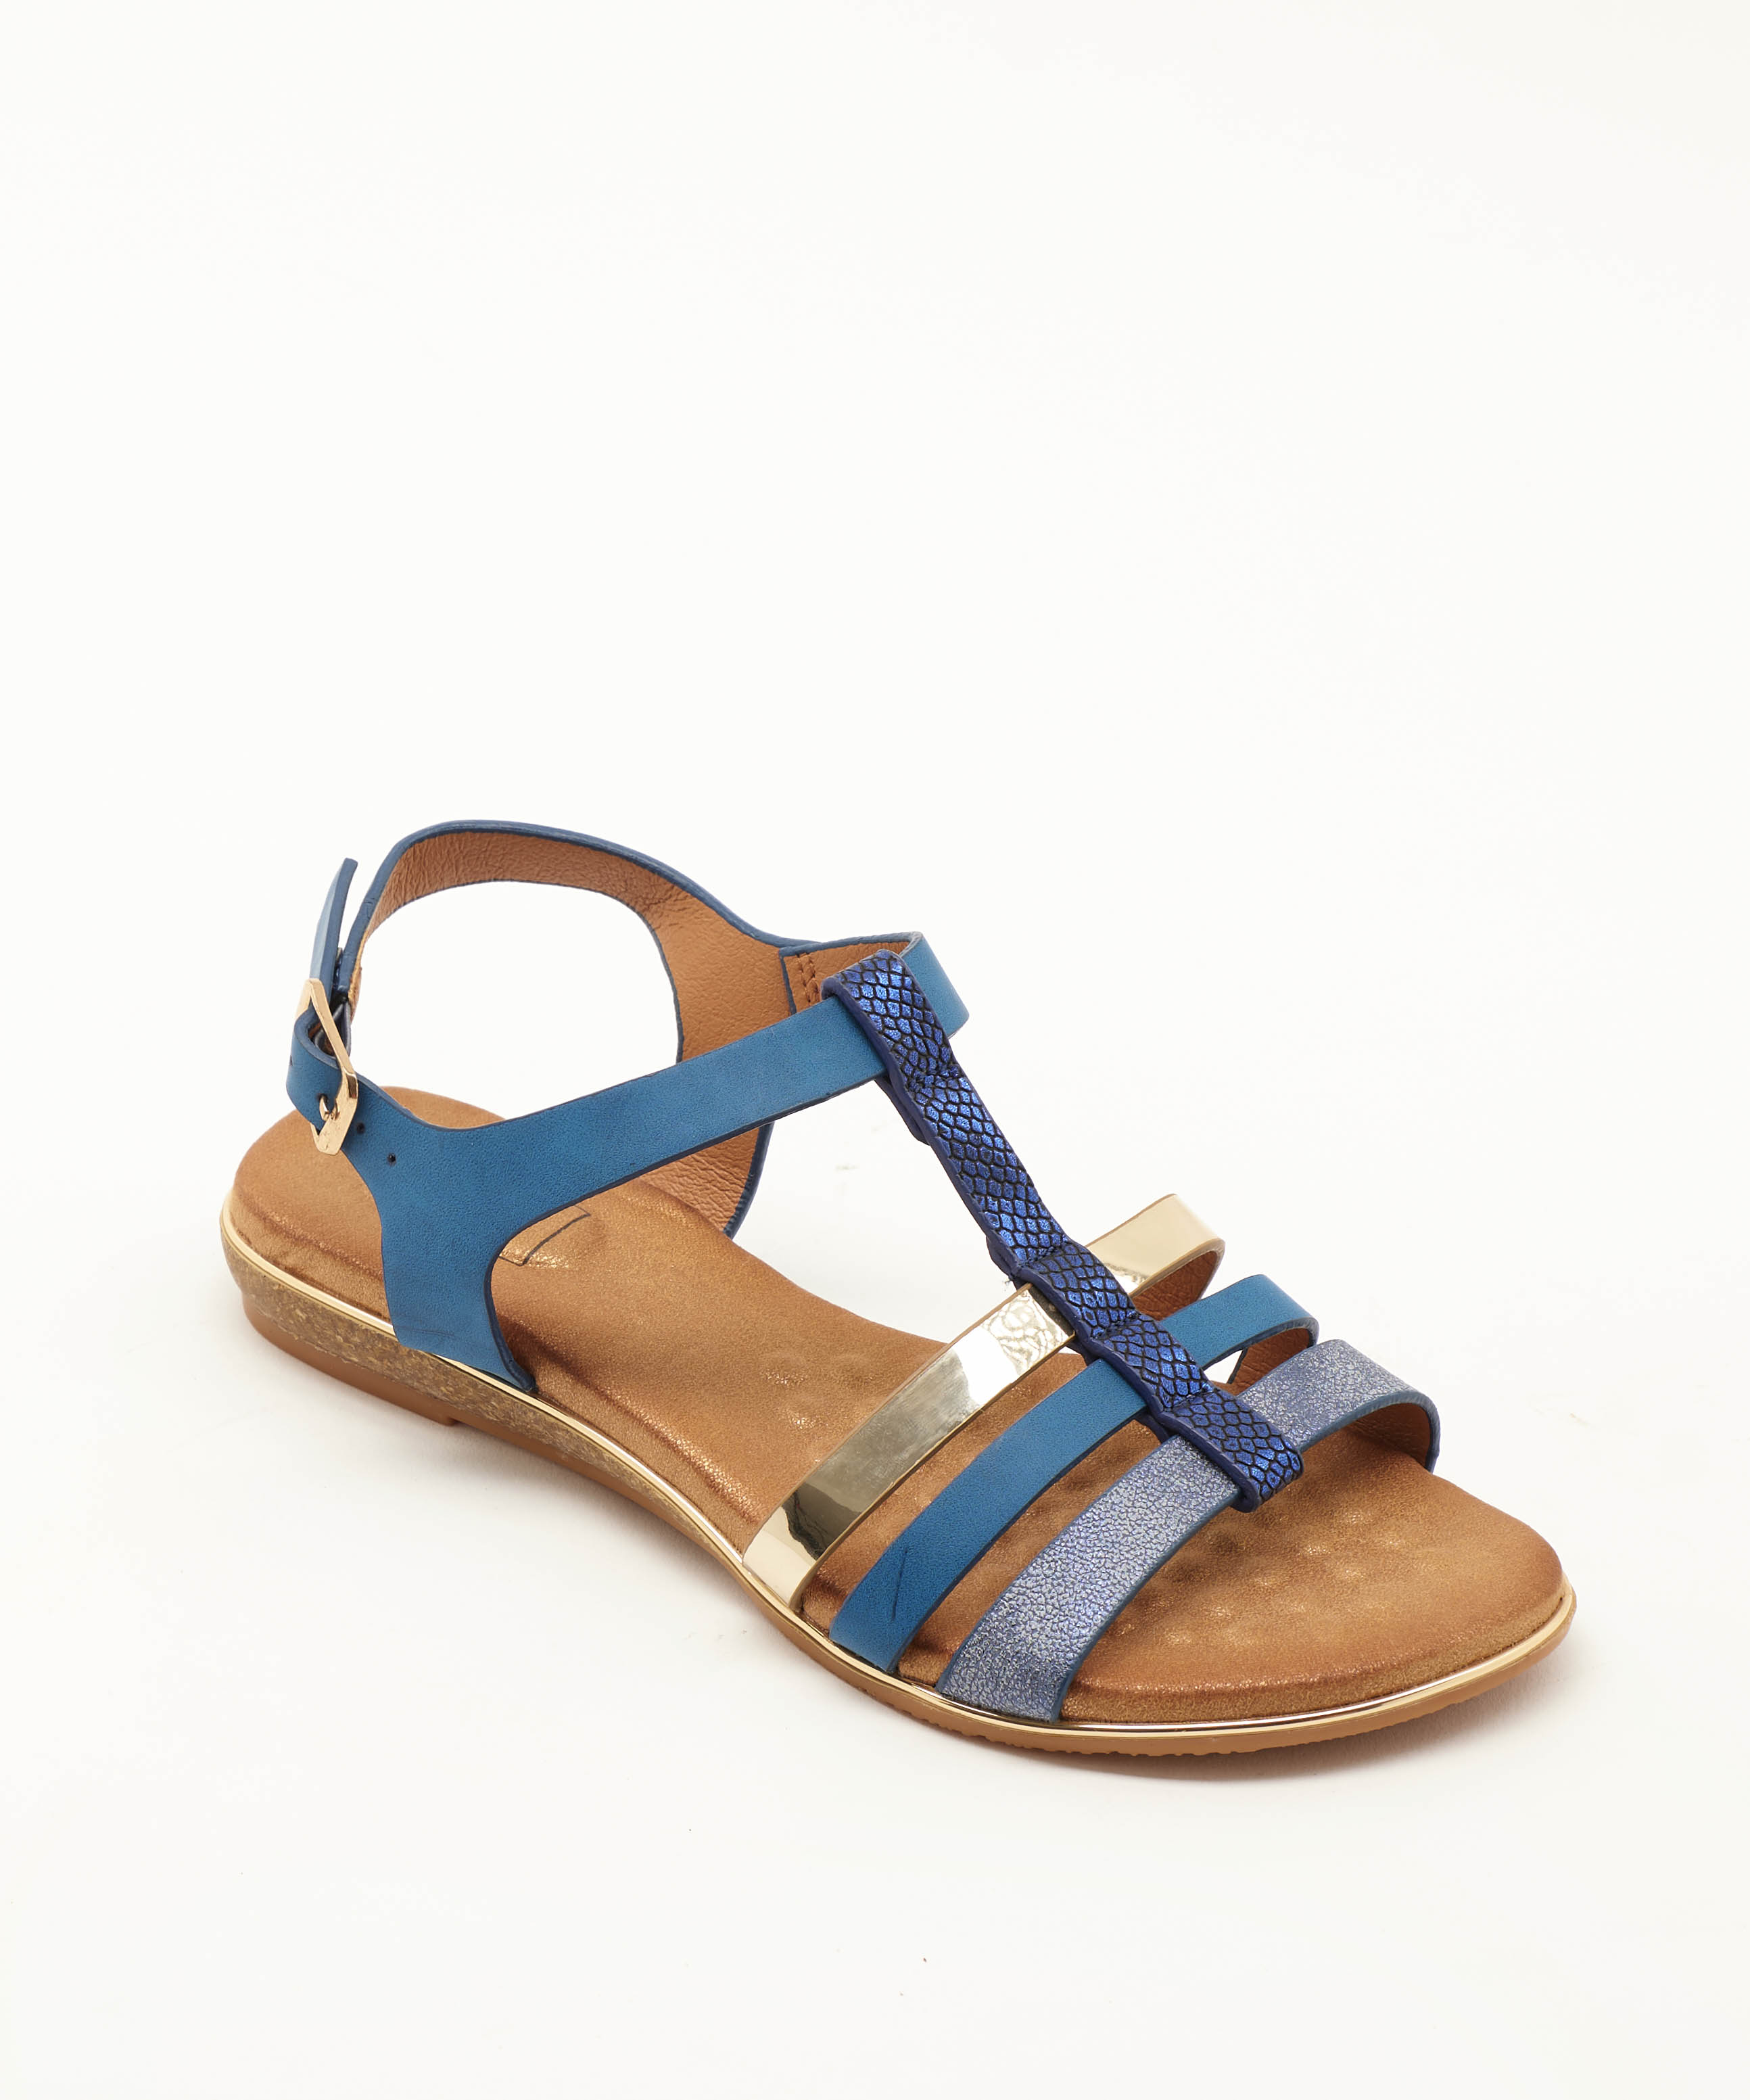 Sandales Plates Femme - Sandale Plate Marine Jina - 17hqf8883-215